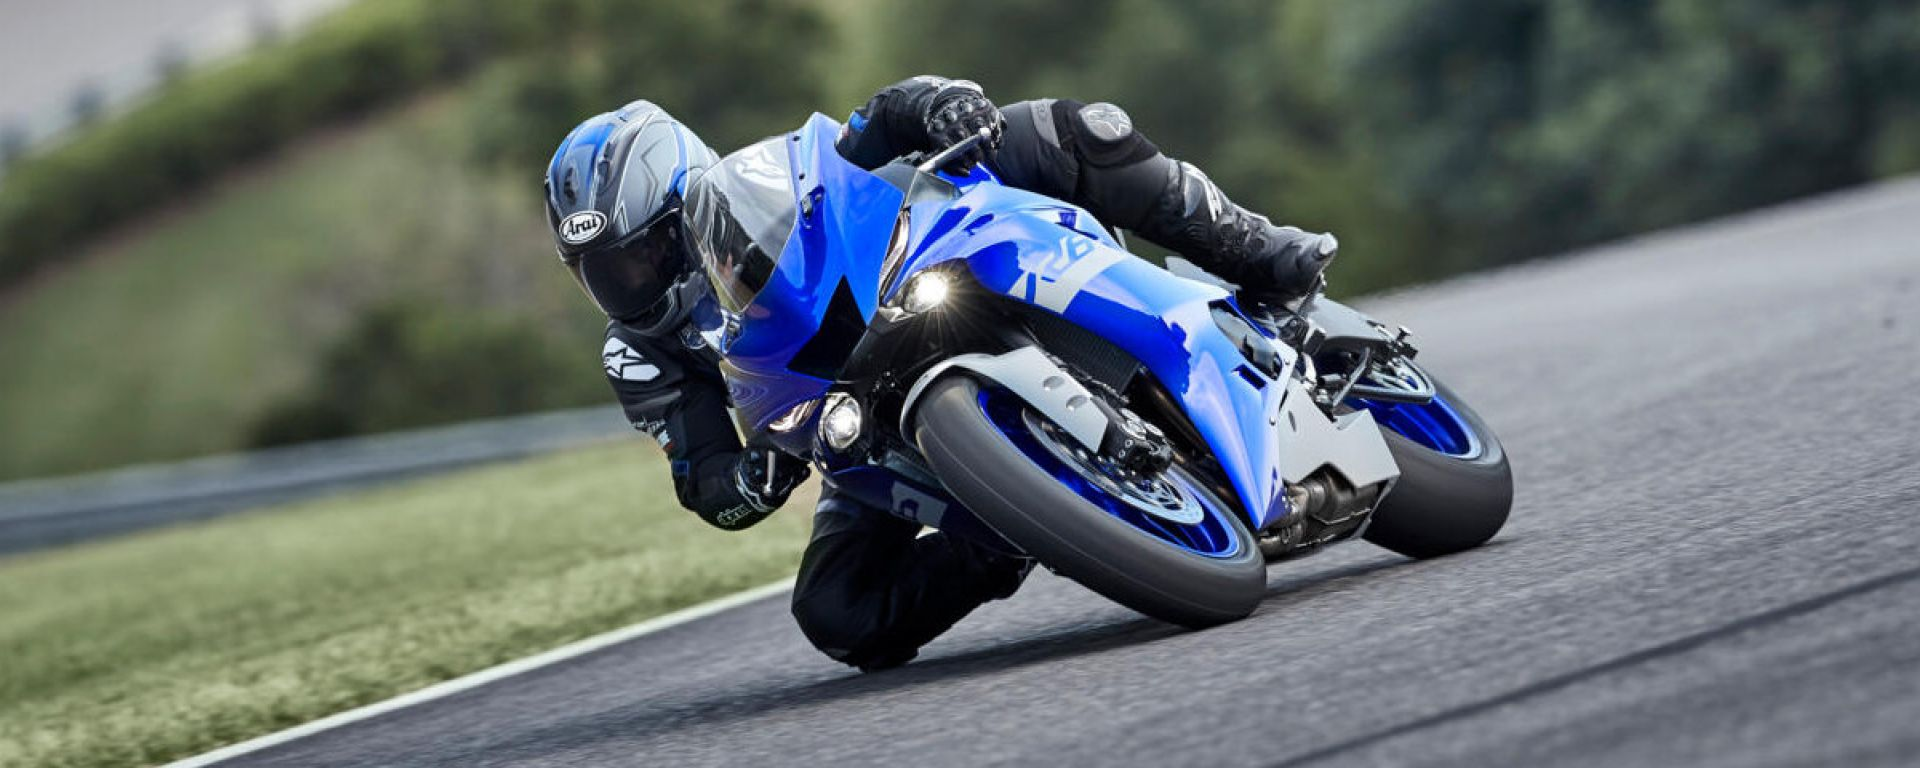 Yamaha: depositati in Giappone i brevetti per delle nuove sportive